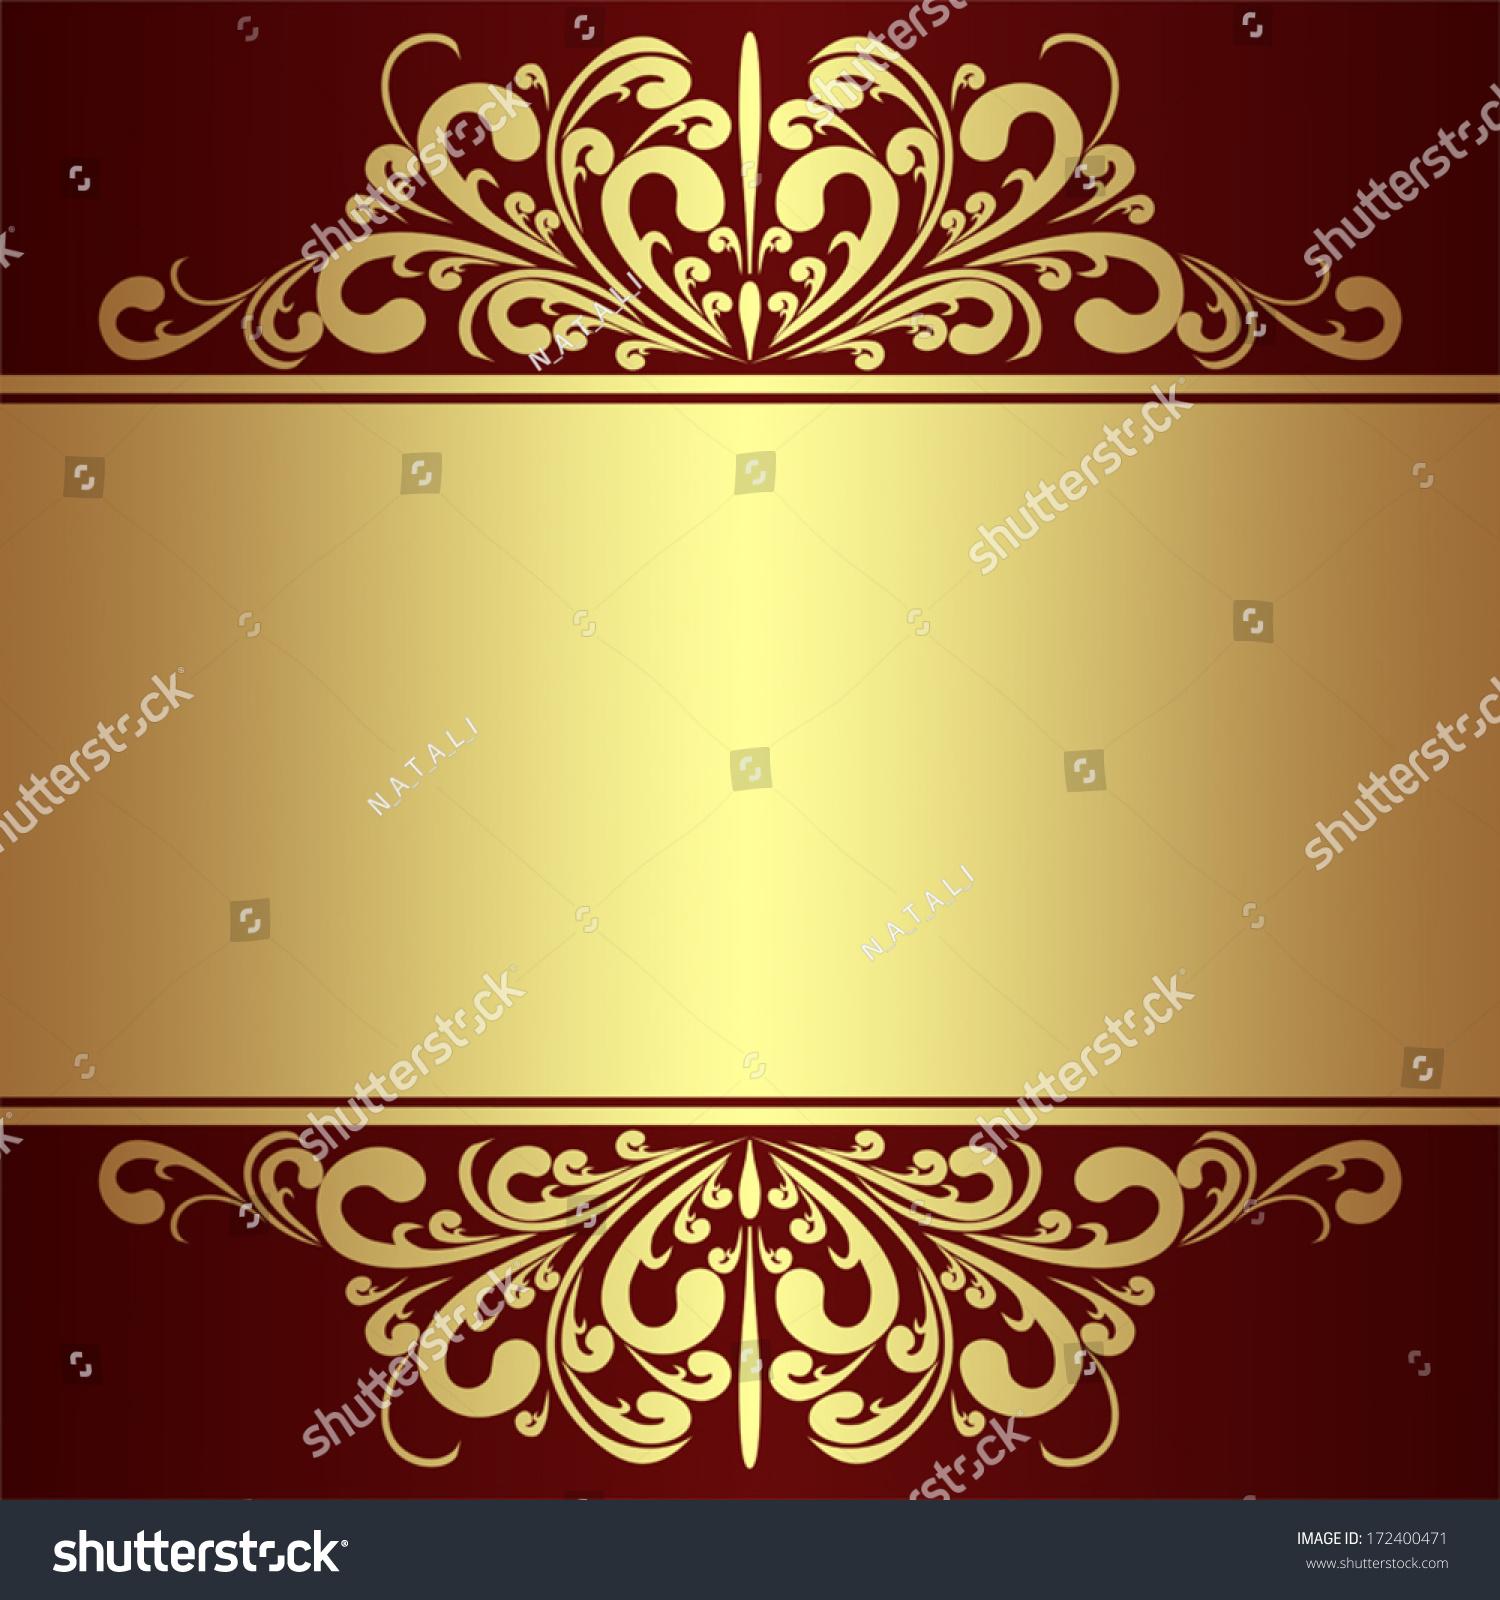 luxury background golden royal borders stock vector